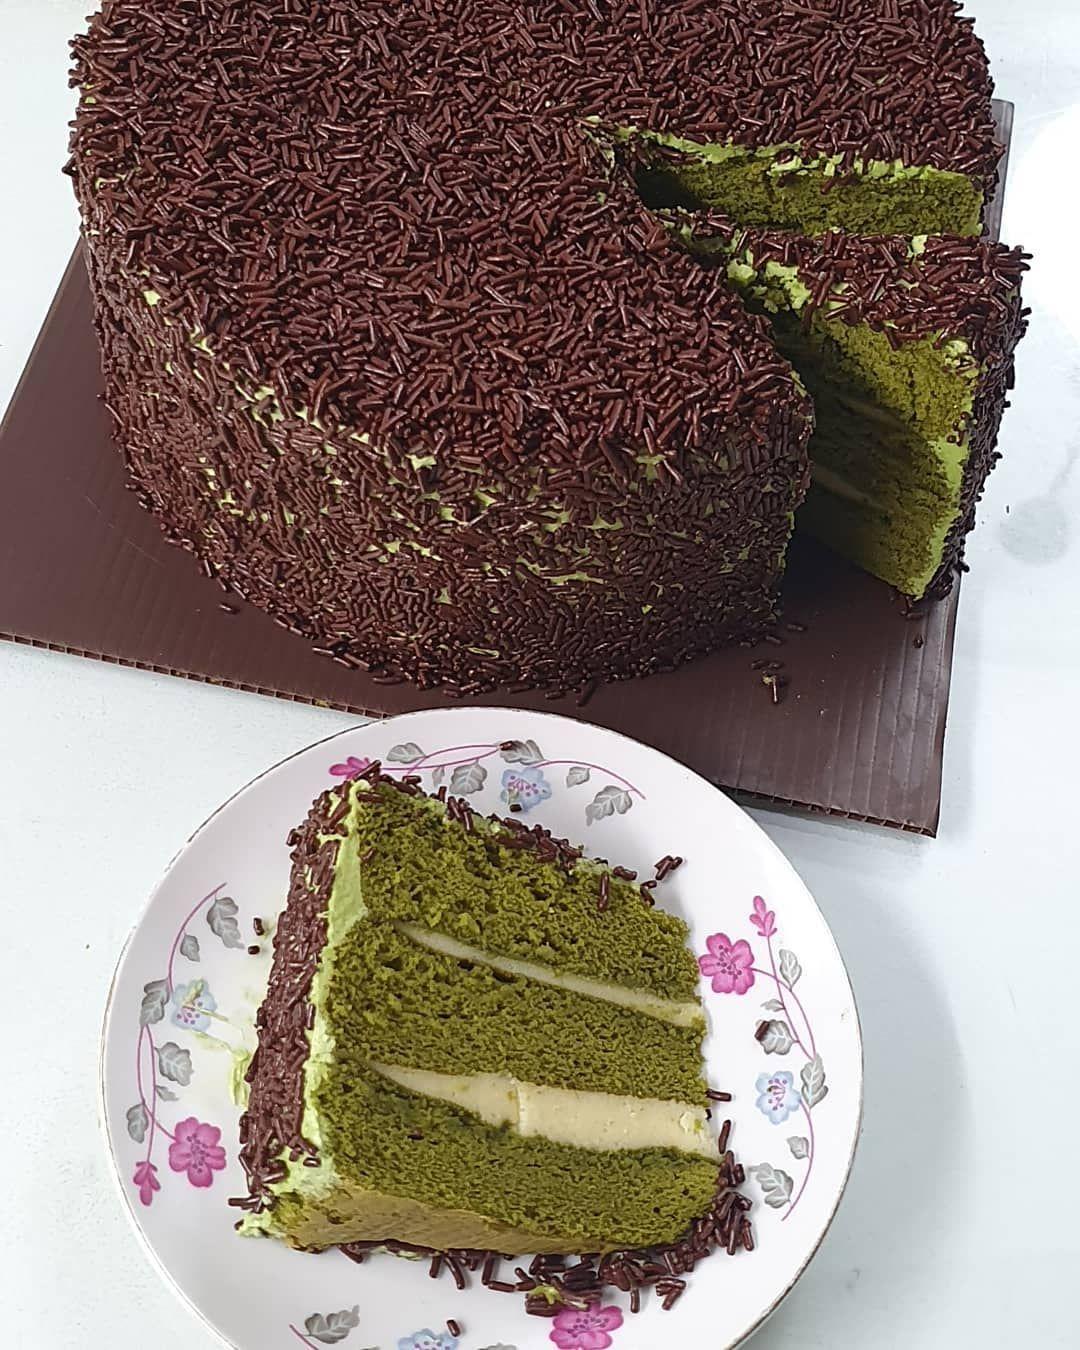 May This Sunday Hold Love Joy Peace And Happiness For You N All These You Love Matcha Green Tea Tart Kemaren Sore Disempatkan B Kue Tart Kue Bolu Kue